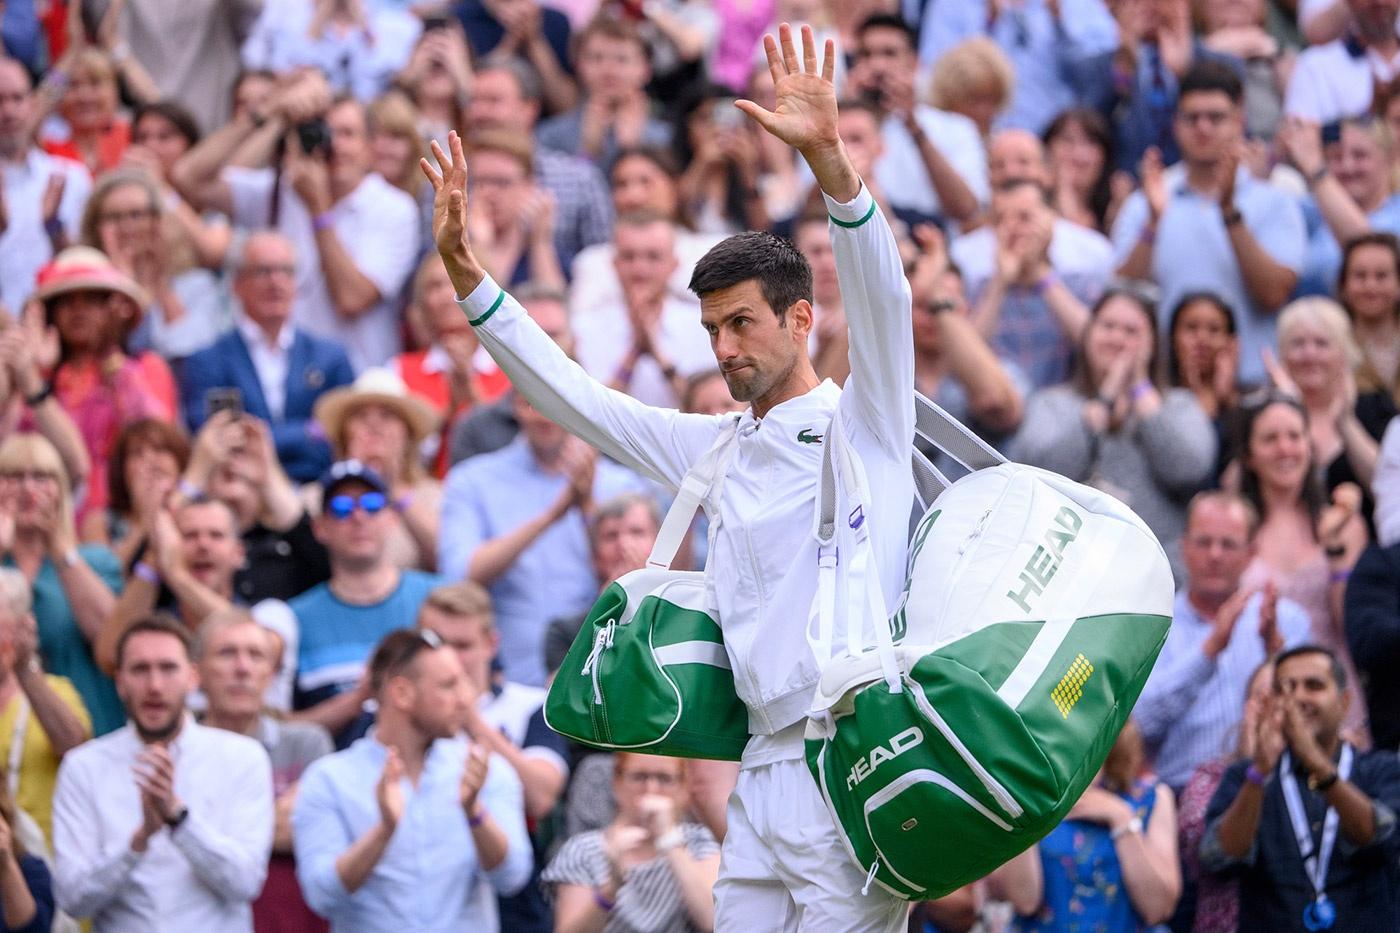 Wimbledon finali 2021: Novak Djokovic - Matteo Berrettini maçı ne zaman, saat kaçta, hangi kanalda? Şifreli mi, şifresiz mi?